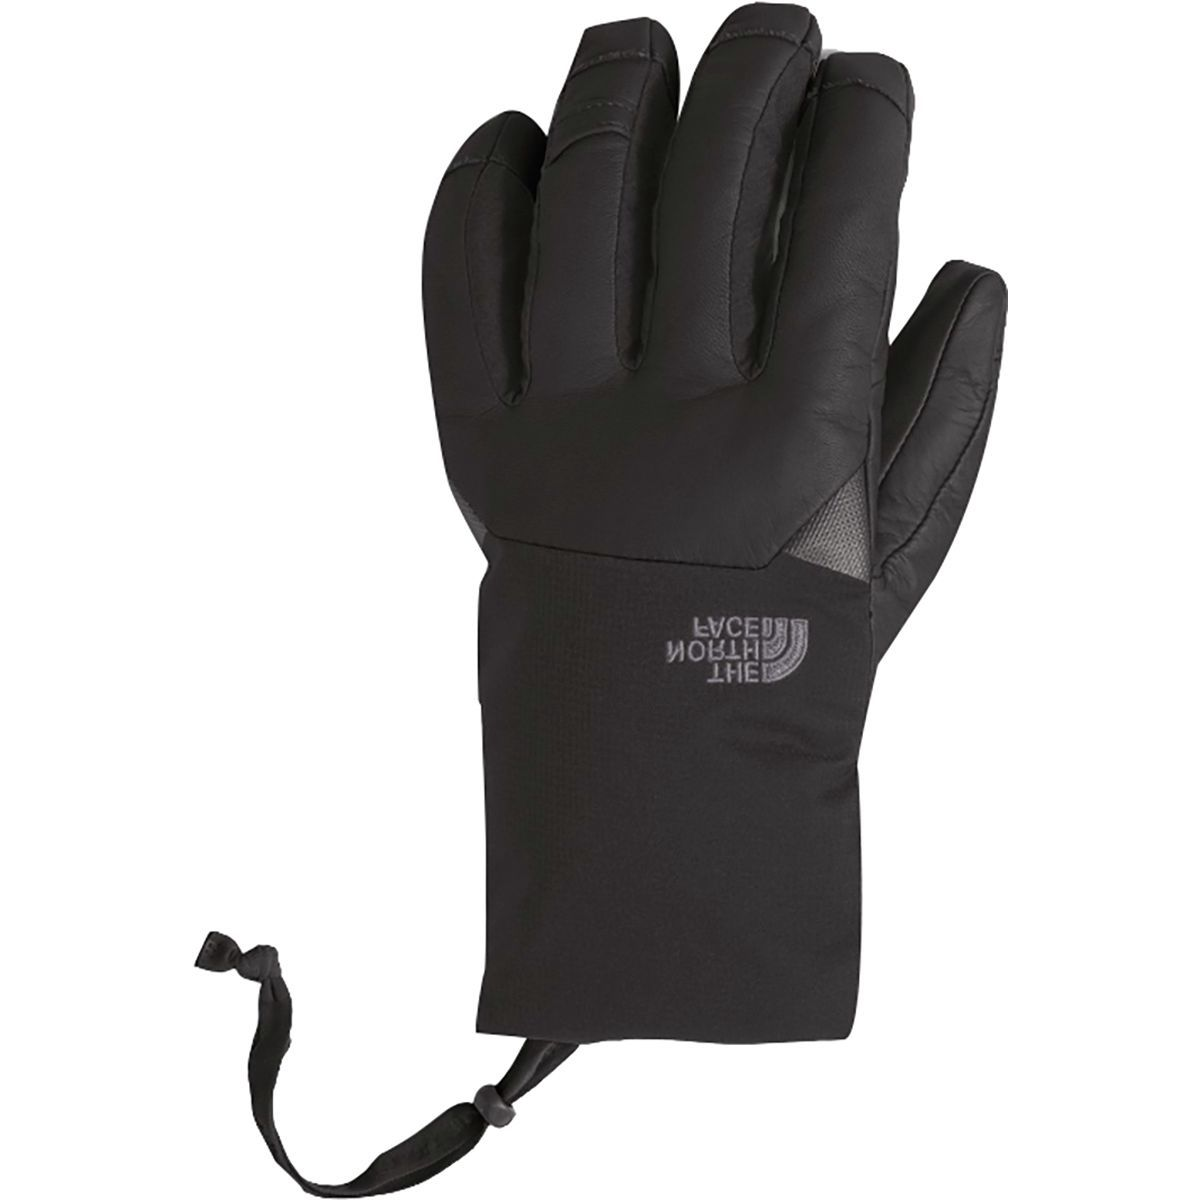 The North Face Patrol Glove - Men's